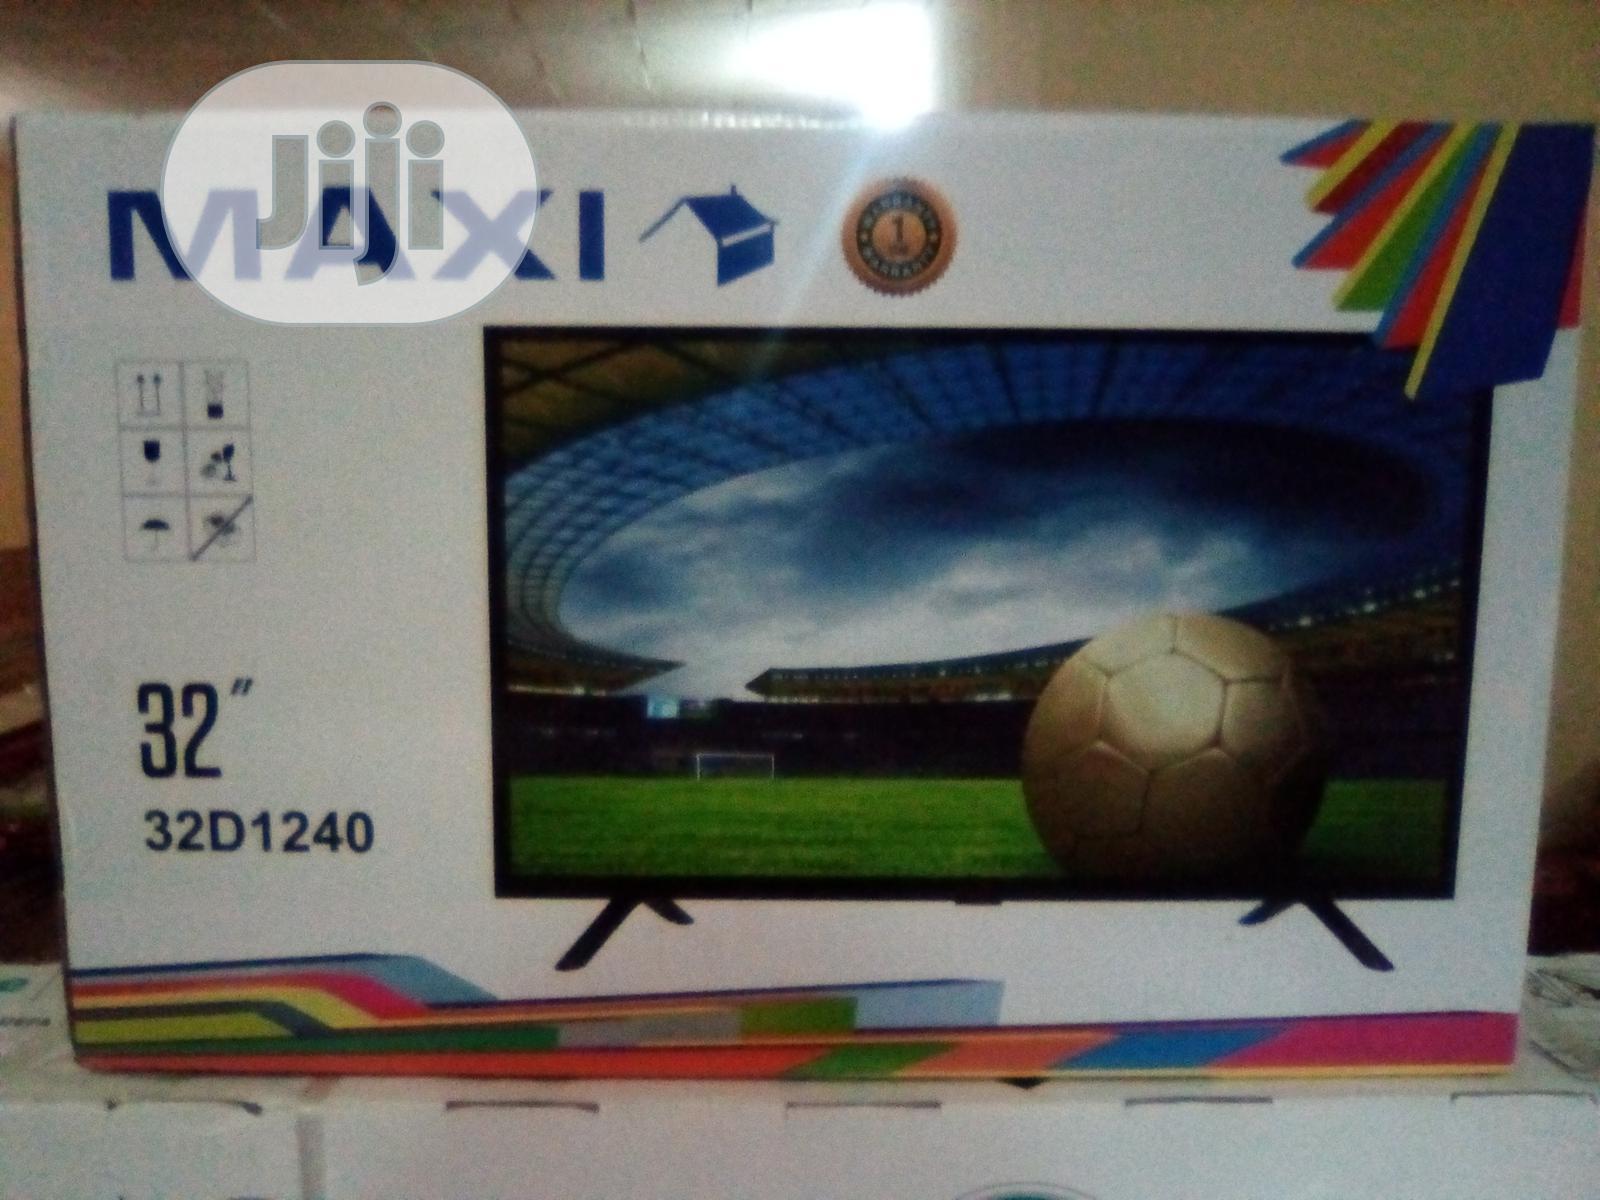 Maxi 32 - Inches HD LED TV D1240